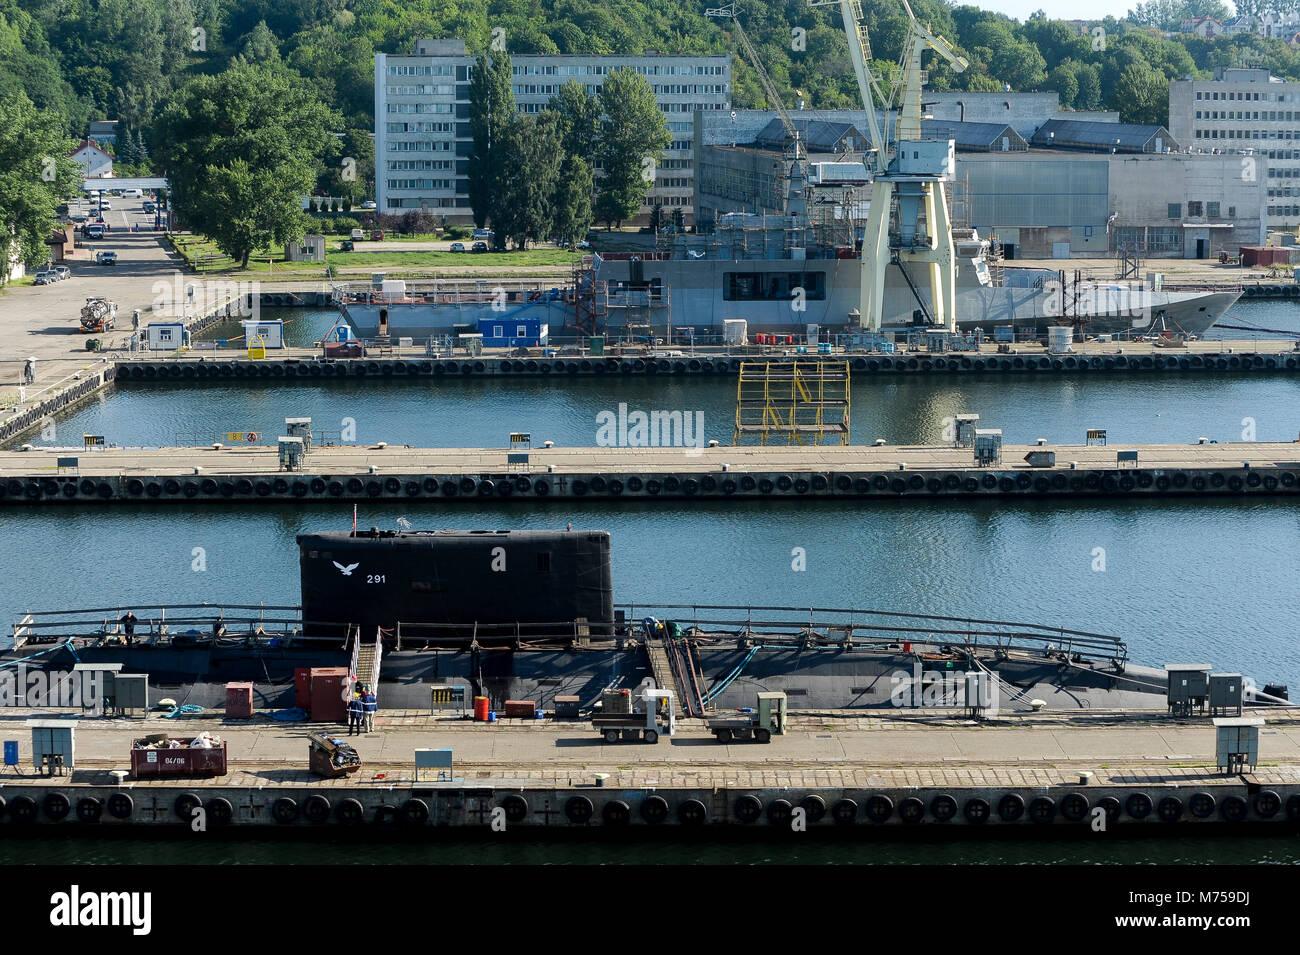 Polish Project 877E (Kilo-class by NATO) submarine ORP Orzel 291 and Polish Offshore Patrol Vessel ORP Slazak in - Stock Image